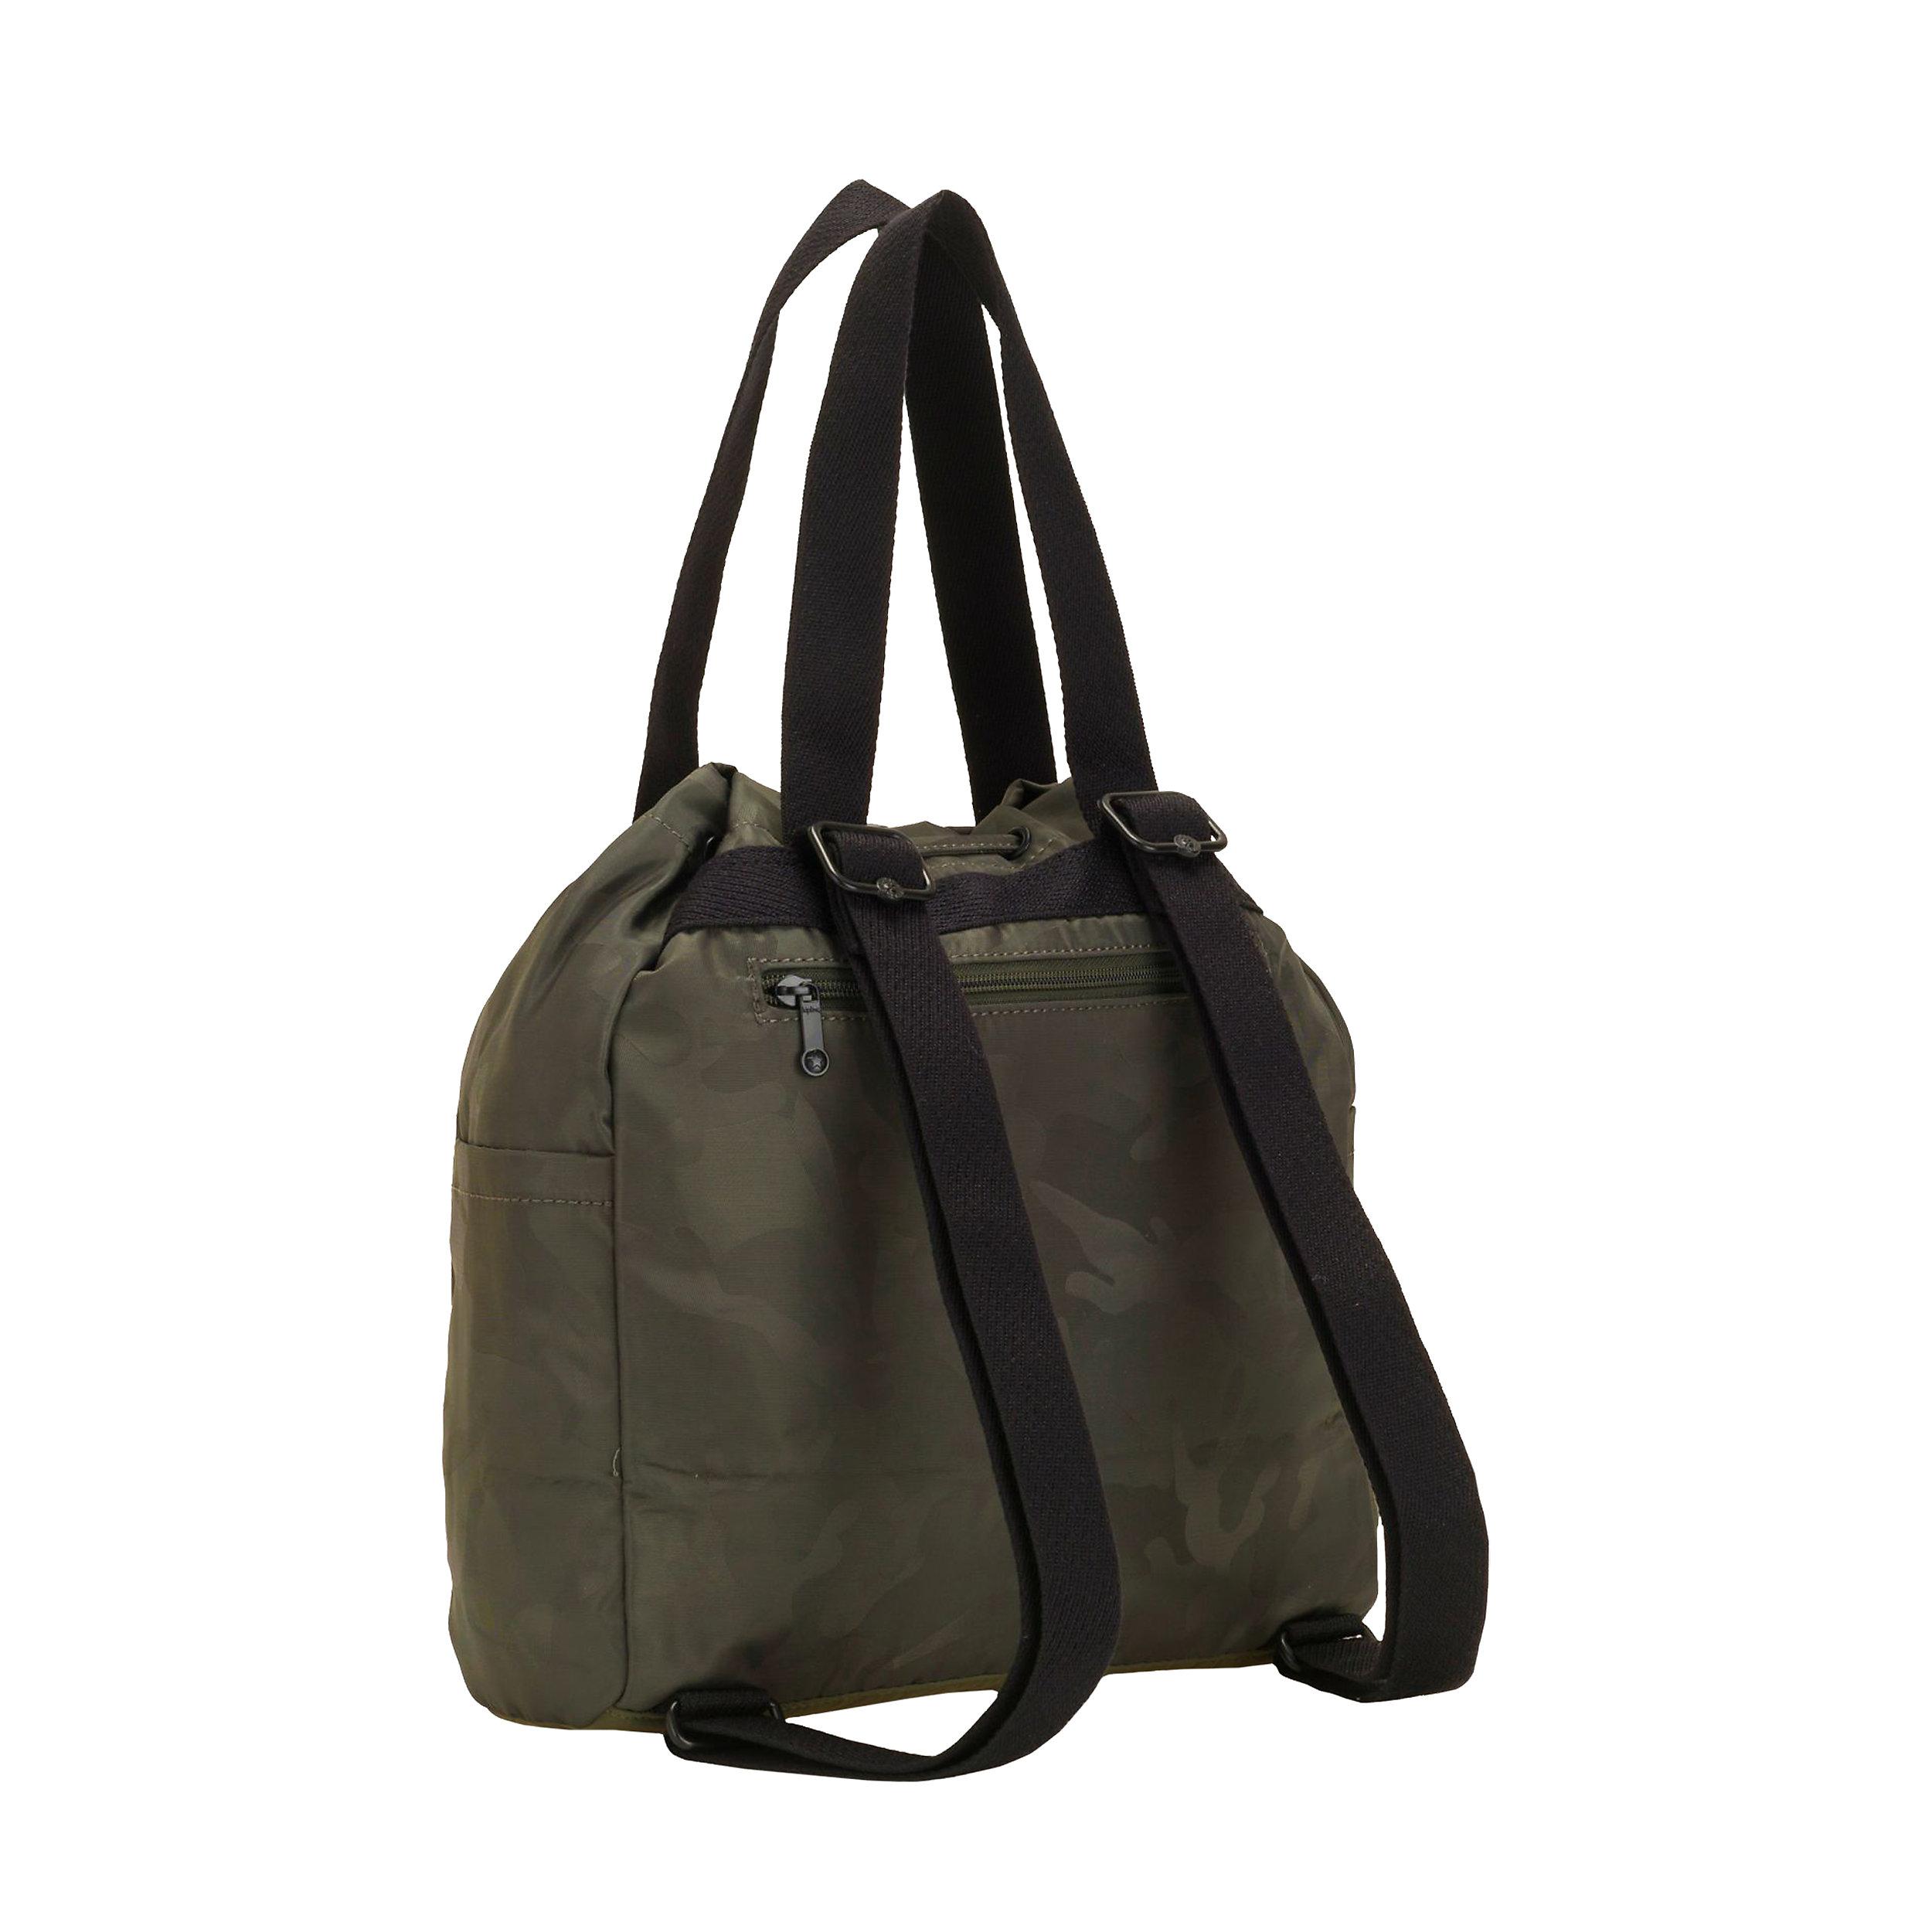 Backpack Art S Basic Elevated 11 Liter